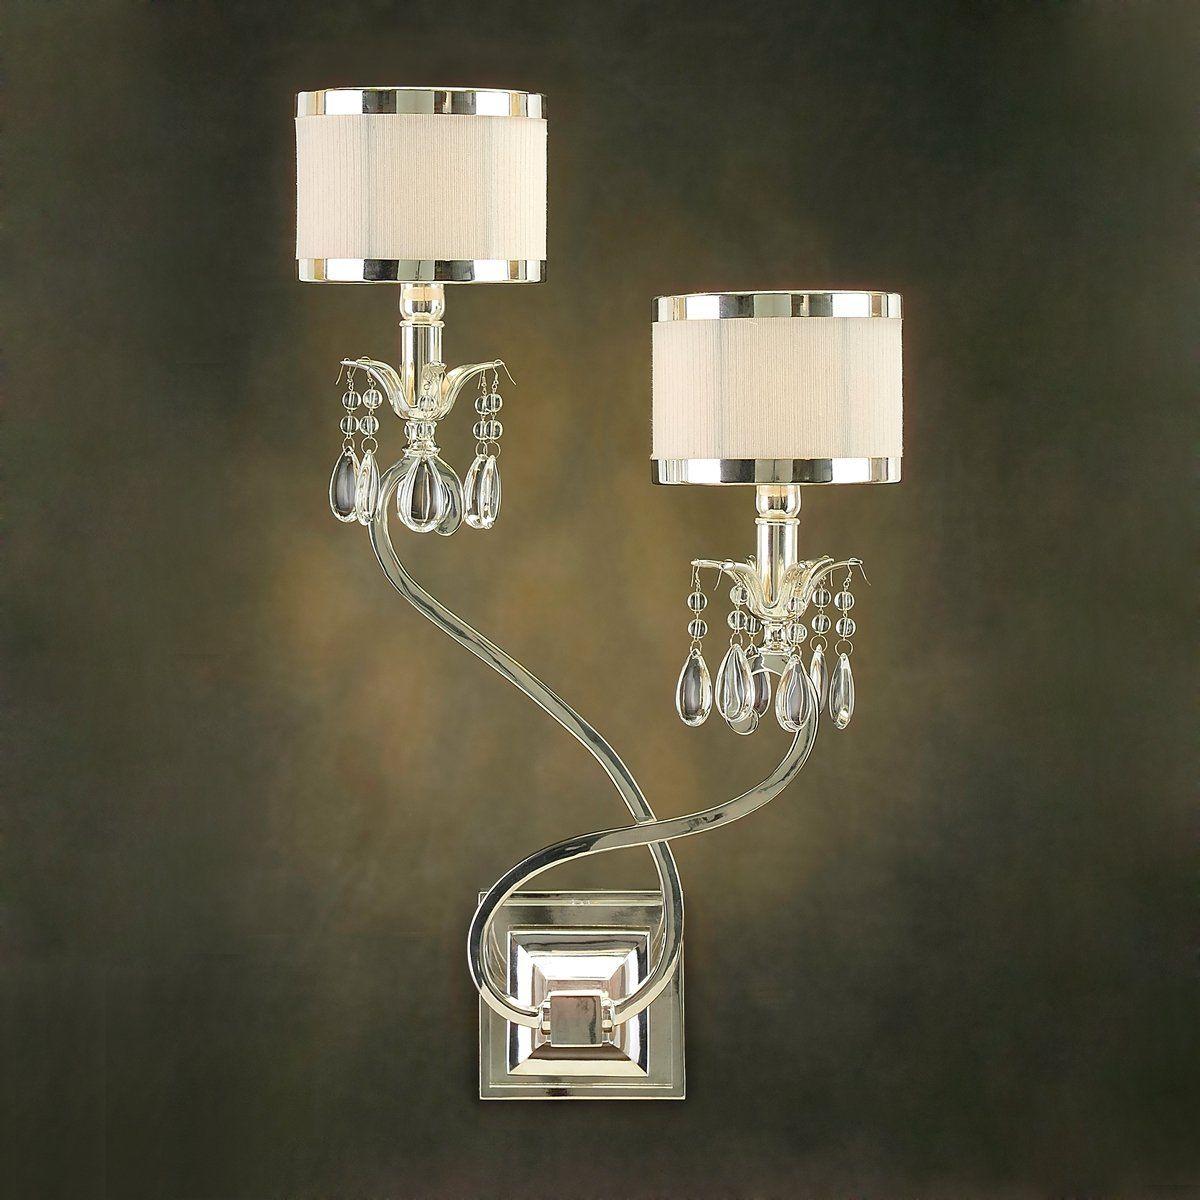 designer wall sconces lighting. Wall Sconces Lighting | And Modern Lamp For Home Interior Lights Designer